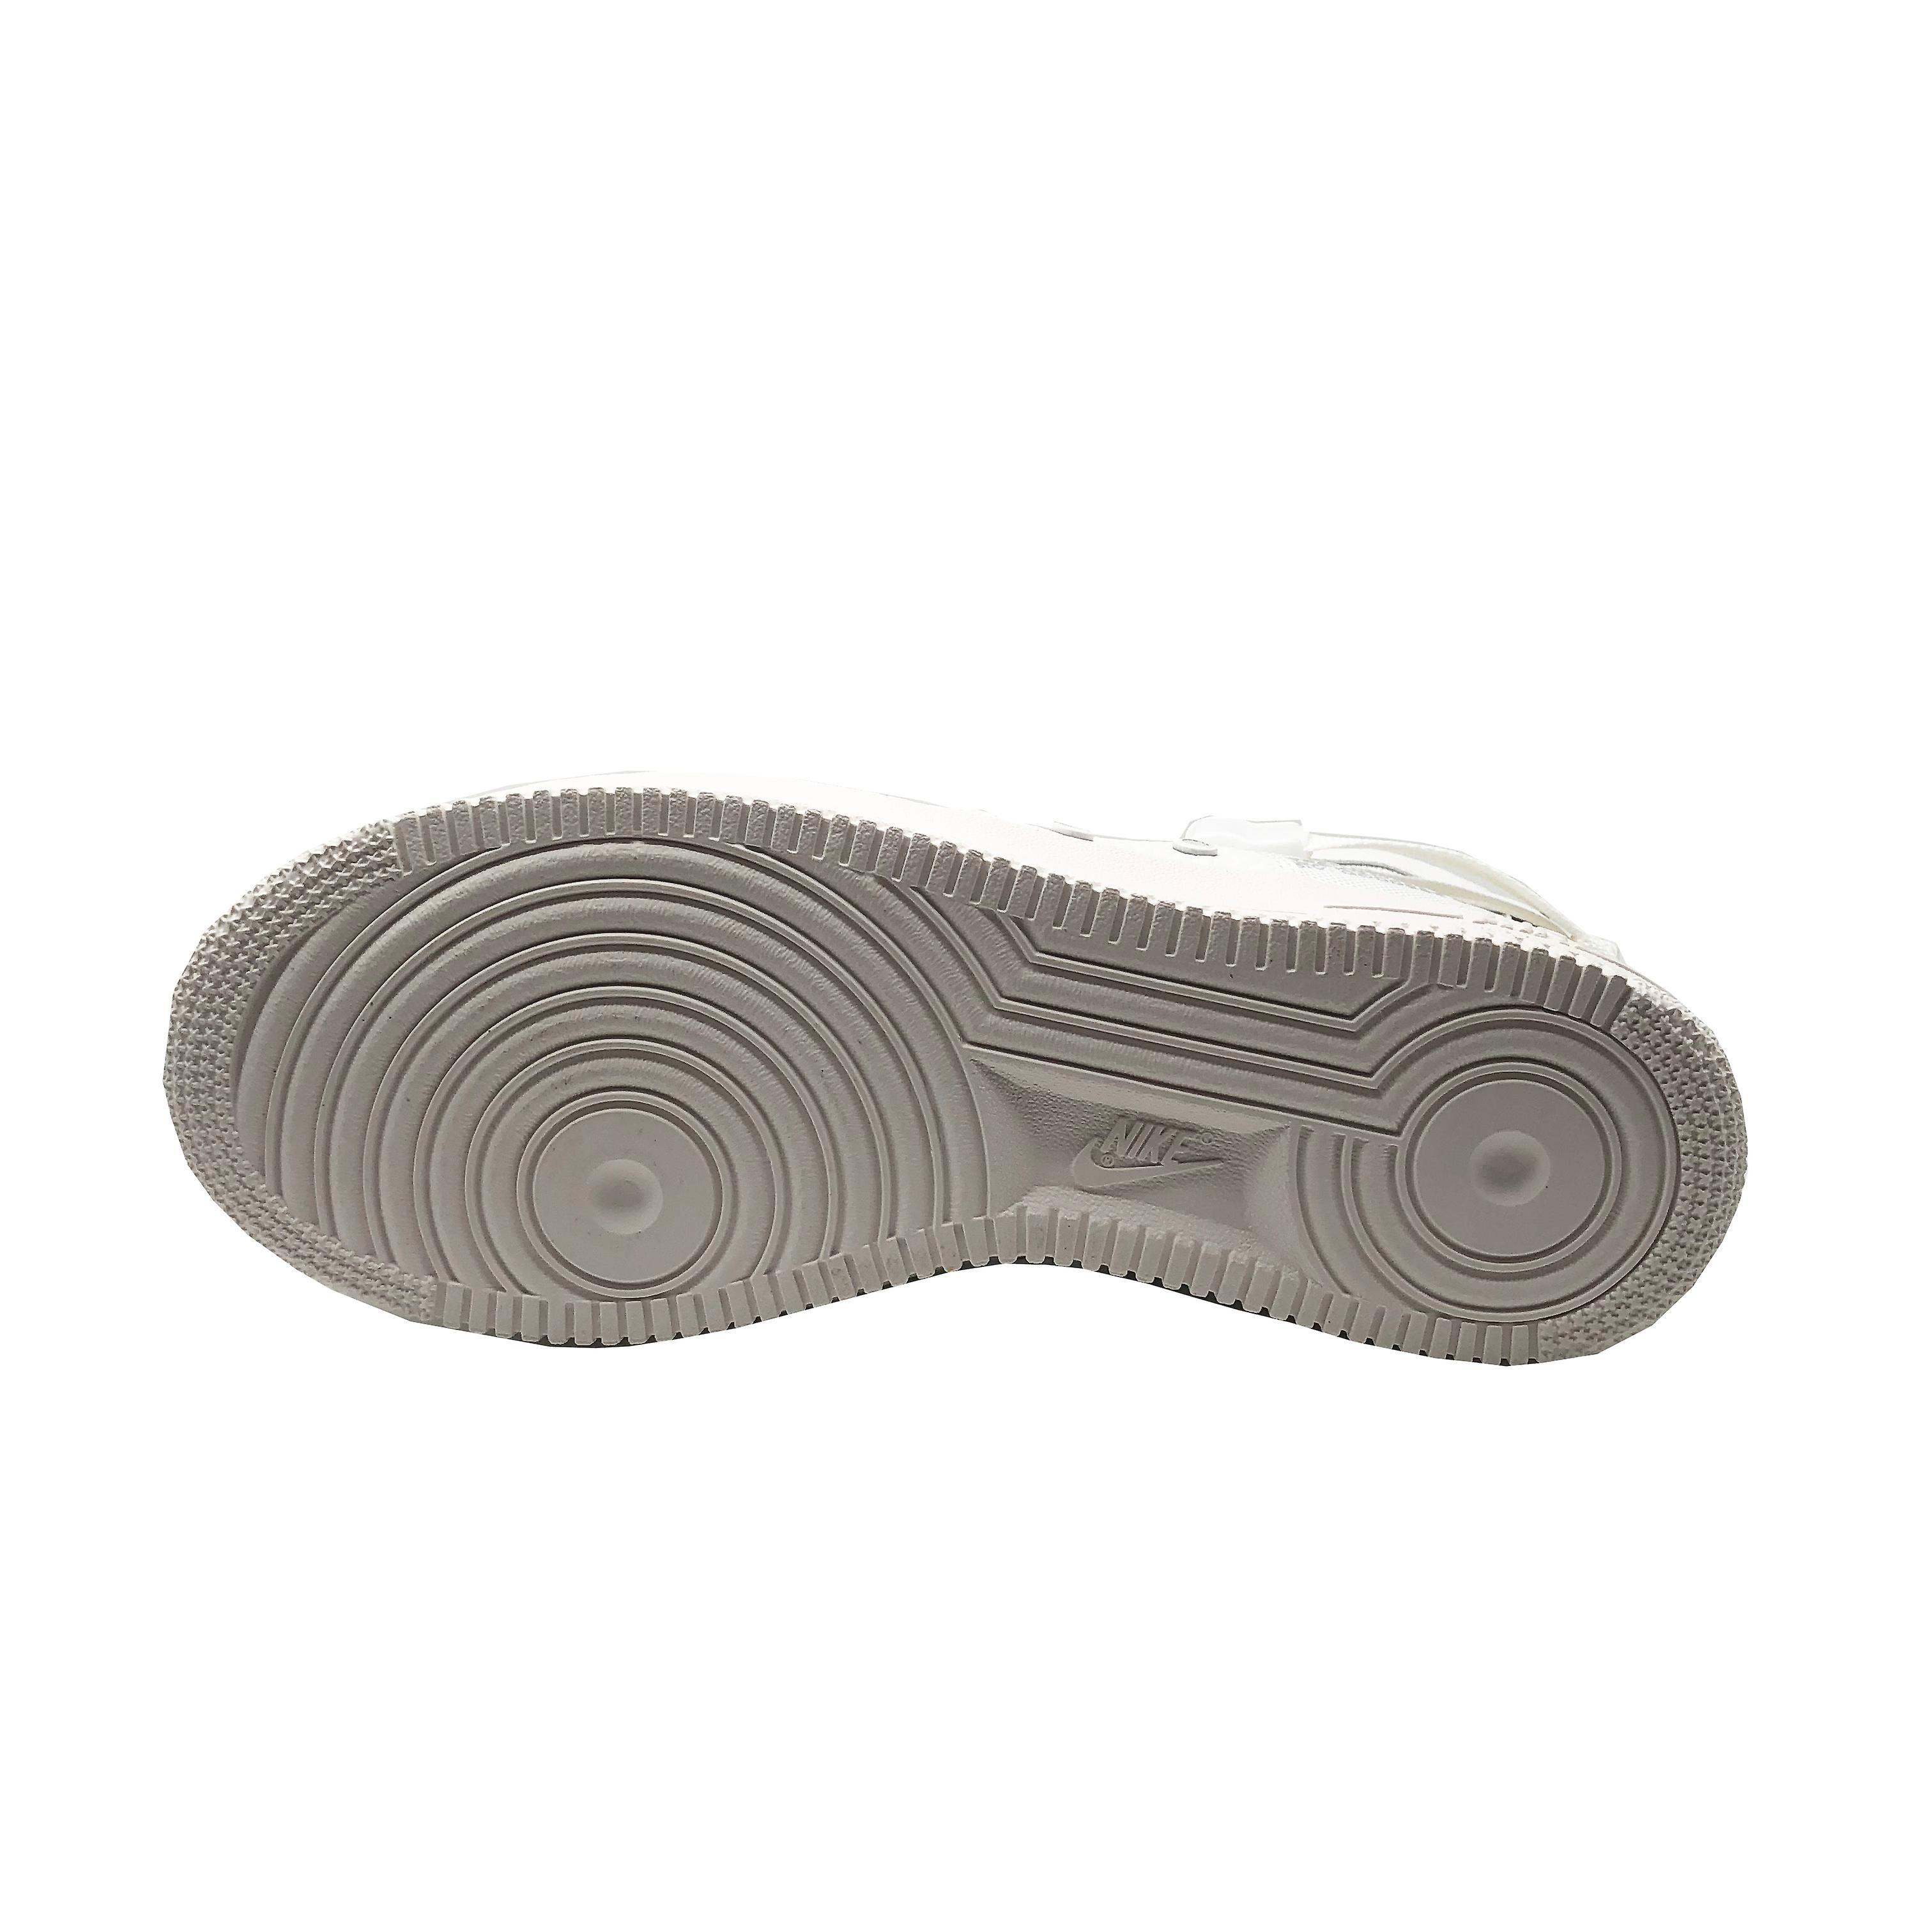 Nike SF AF1 MID AA6655 100 Mens Trainer